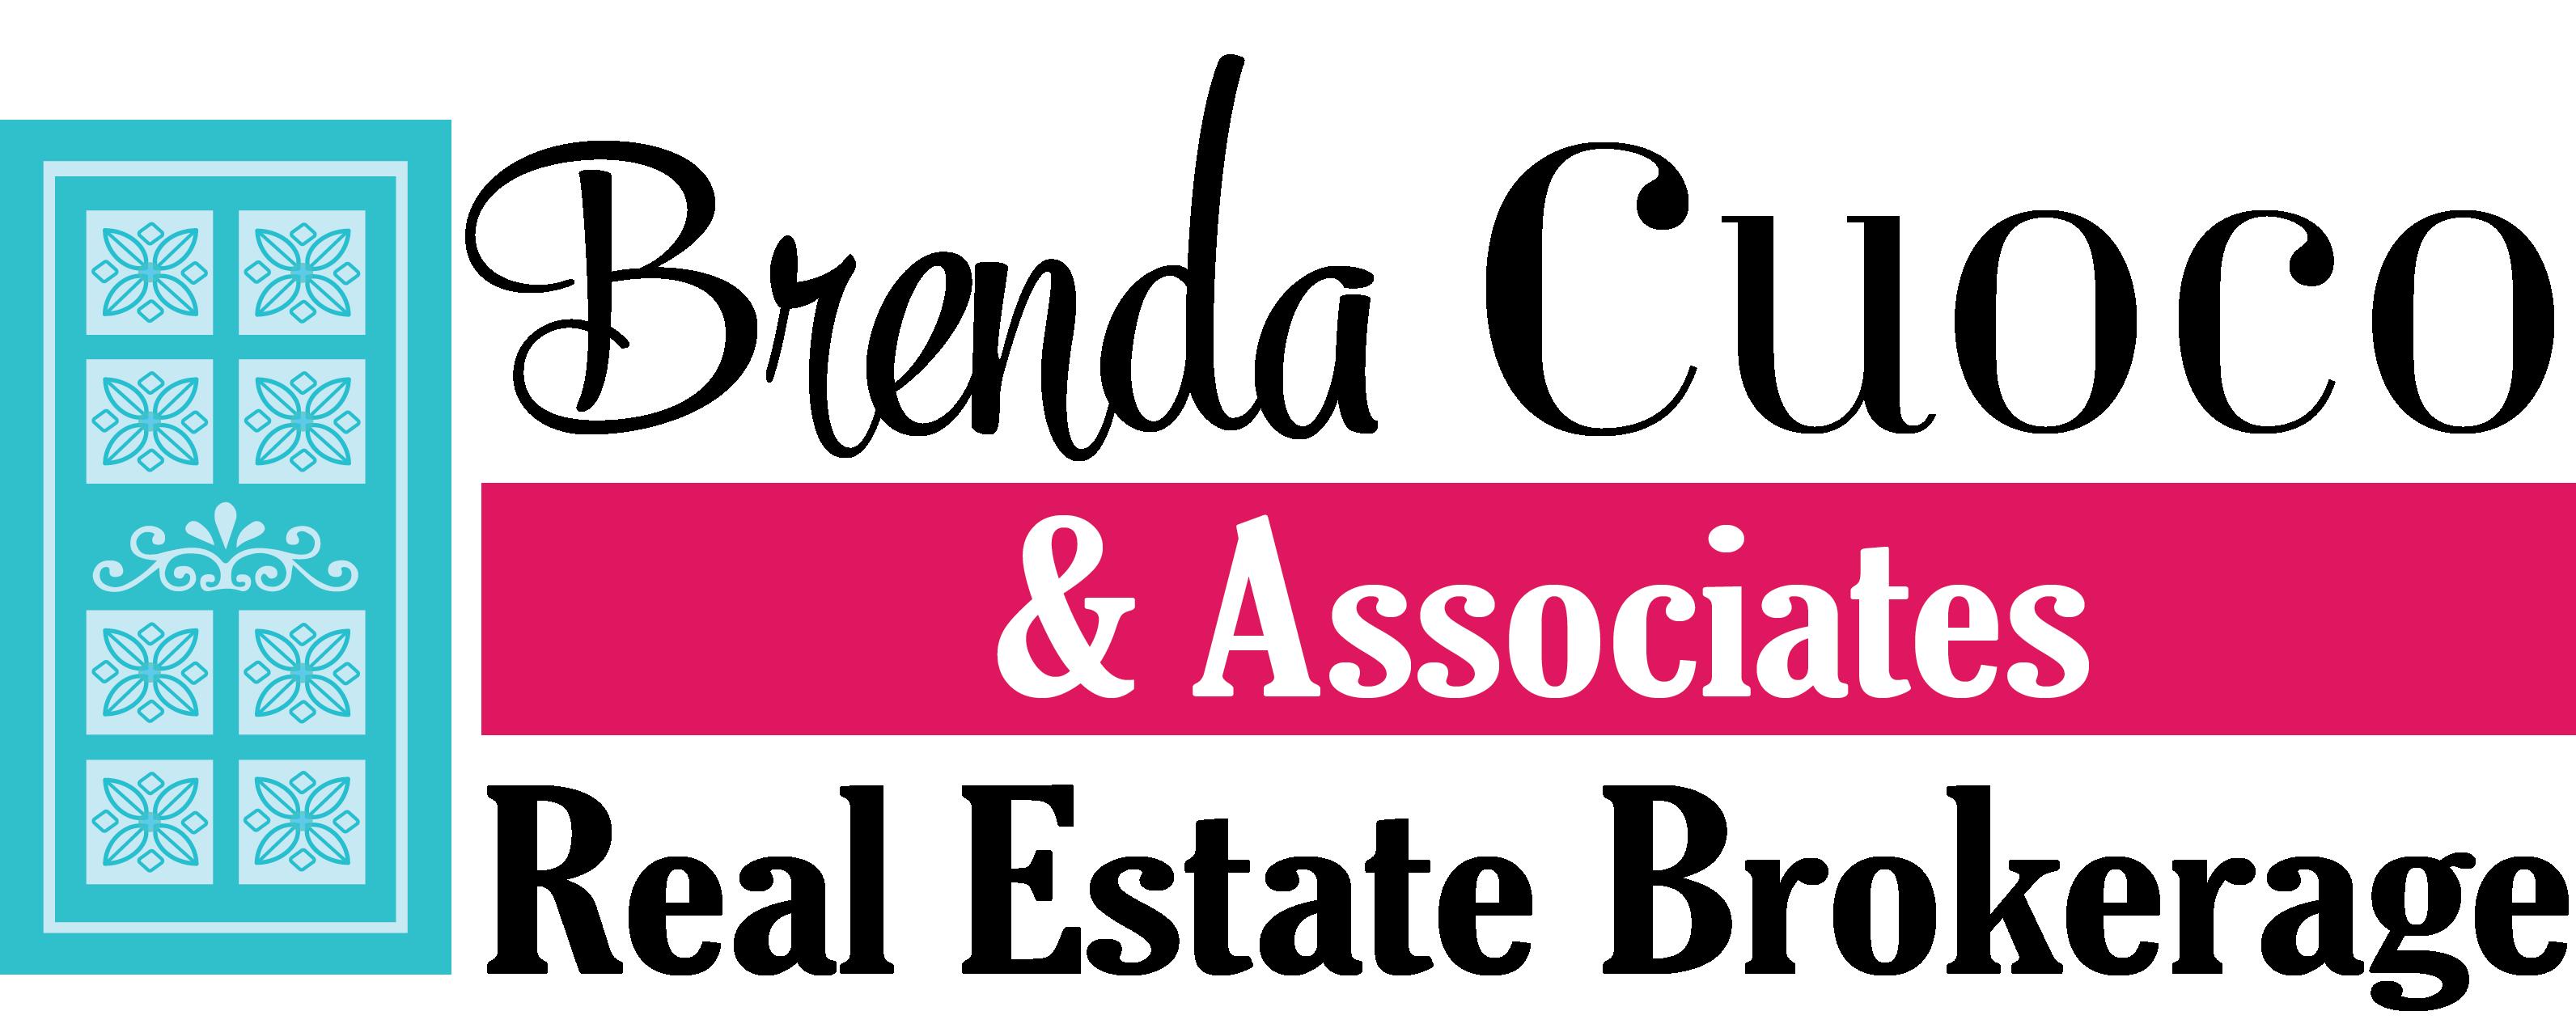 Brenda Cuoco Logo